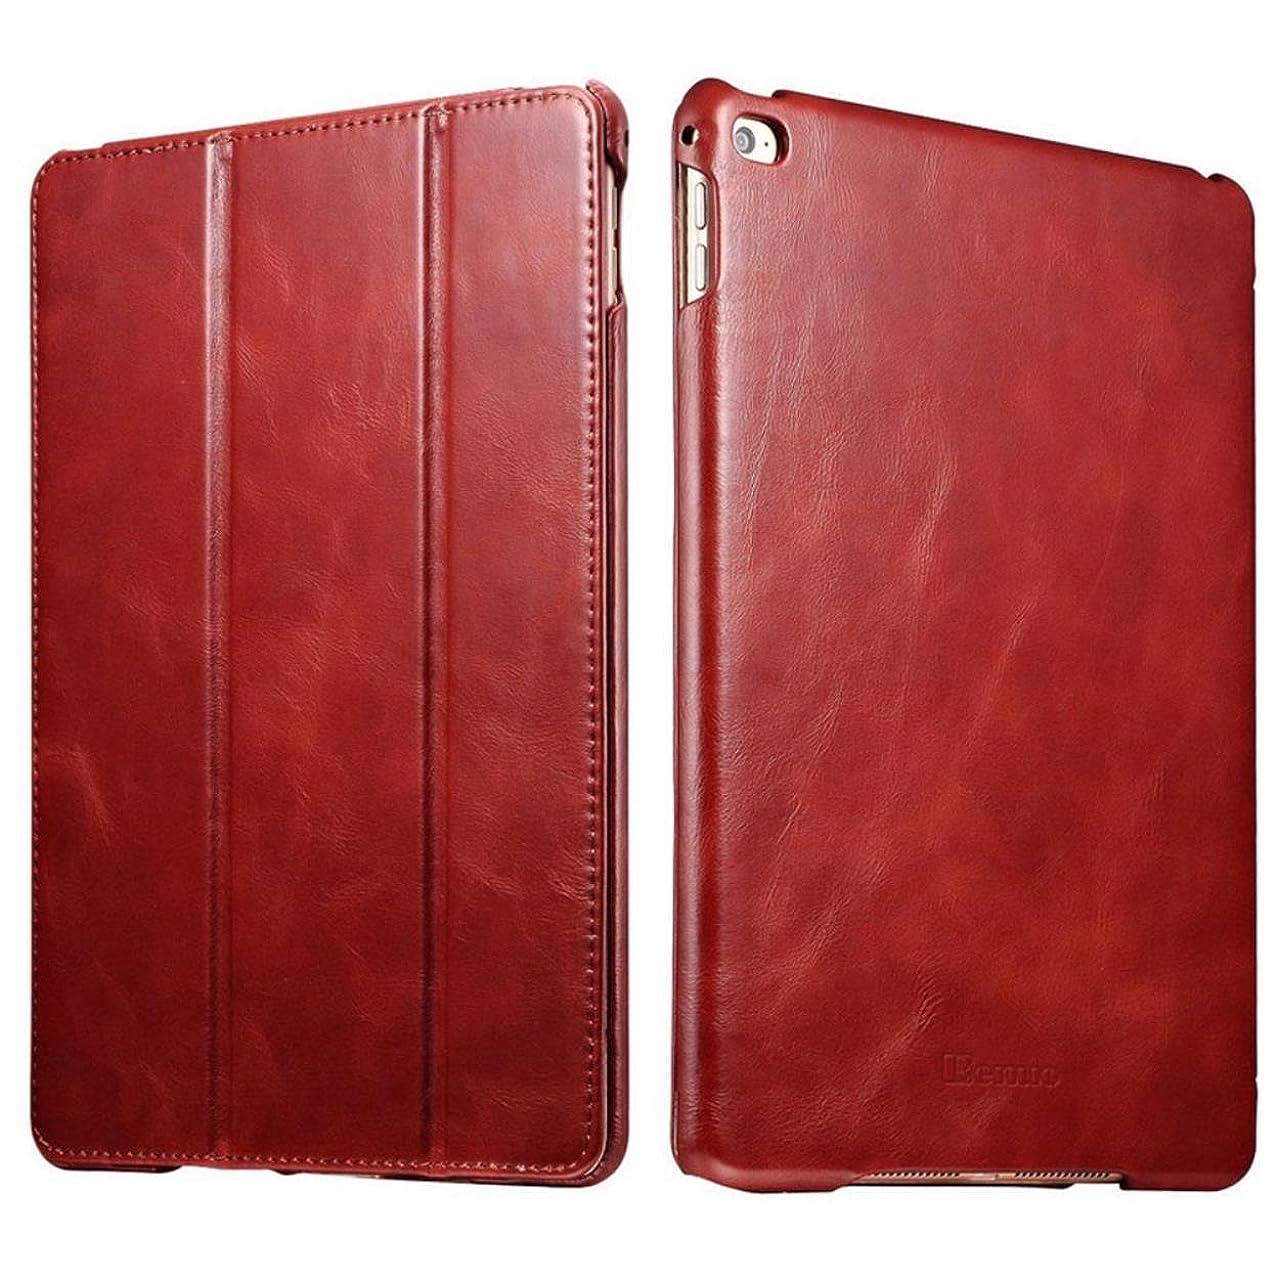 iPad Mini4 Genuine Flip, CHEETOP Premium Consice Vintage Real Leather Ultra-thin Folio Auto Wake UP/Sleep Stand Magnetic Closure Case Cover for Apple iPad Mini 4 (Red)